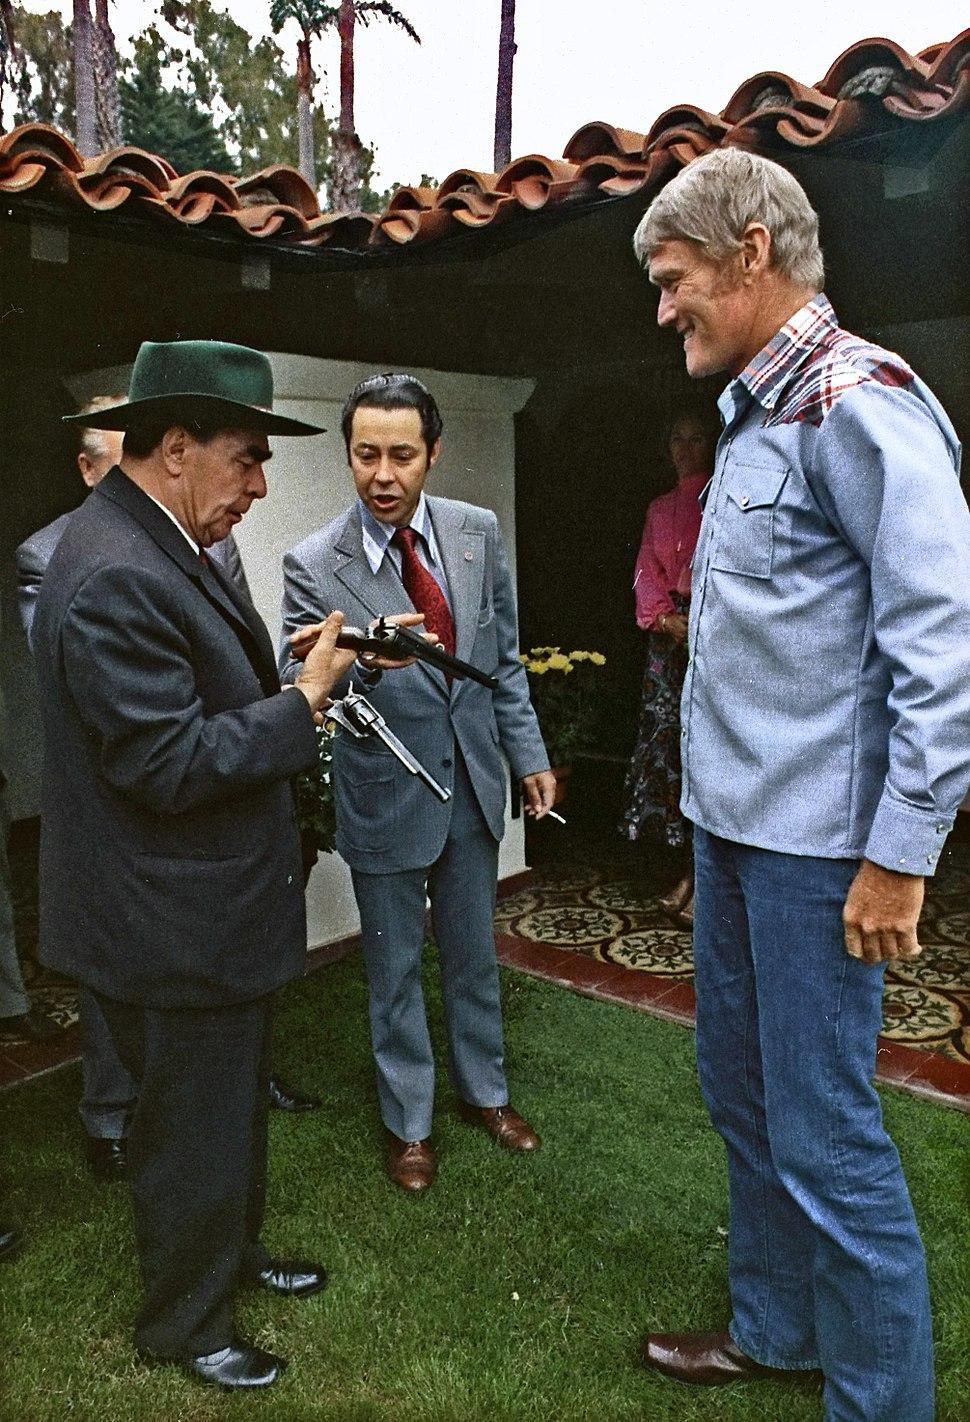 General Secretary Brezhnev meets actor Chuck Connors, at San Clemente - NARA - 194526 - edited